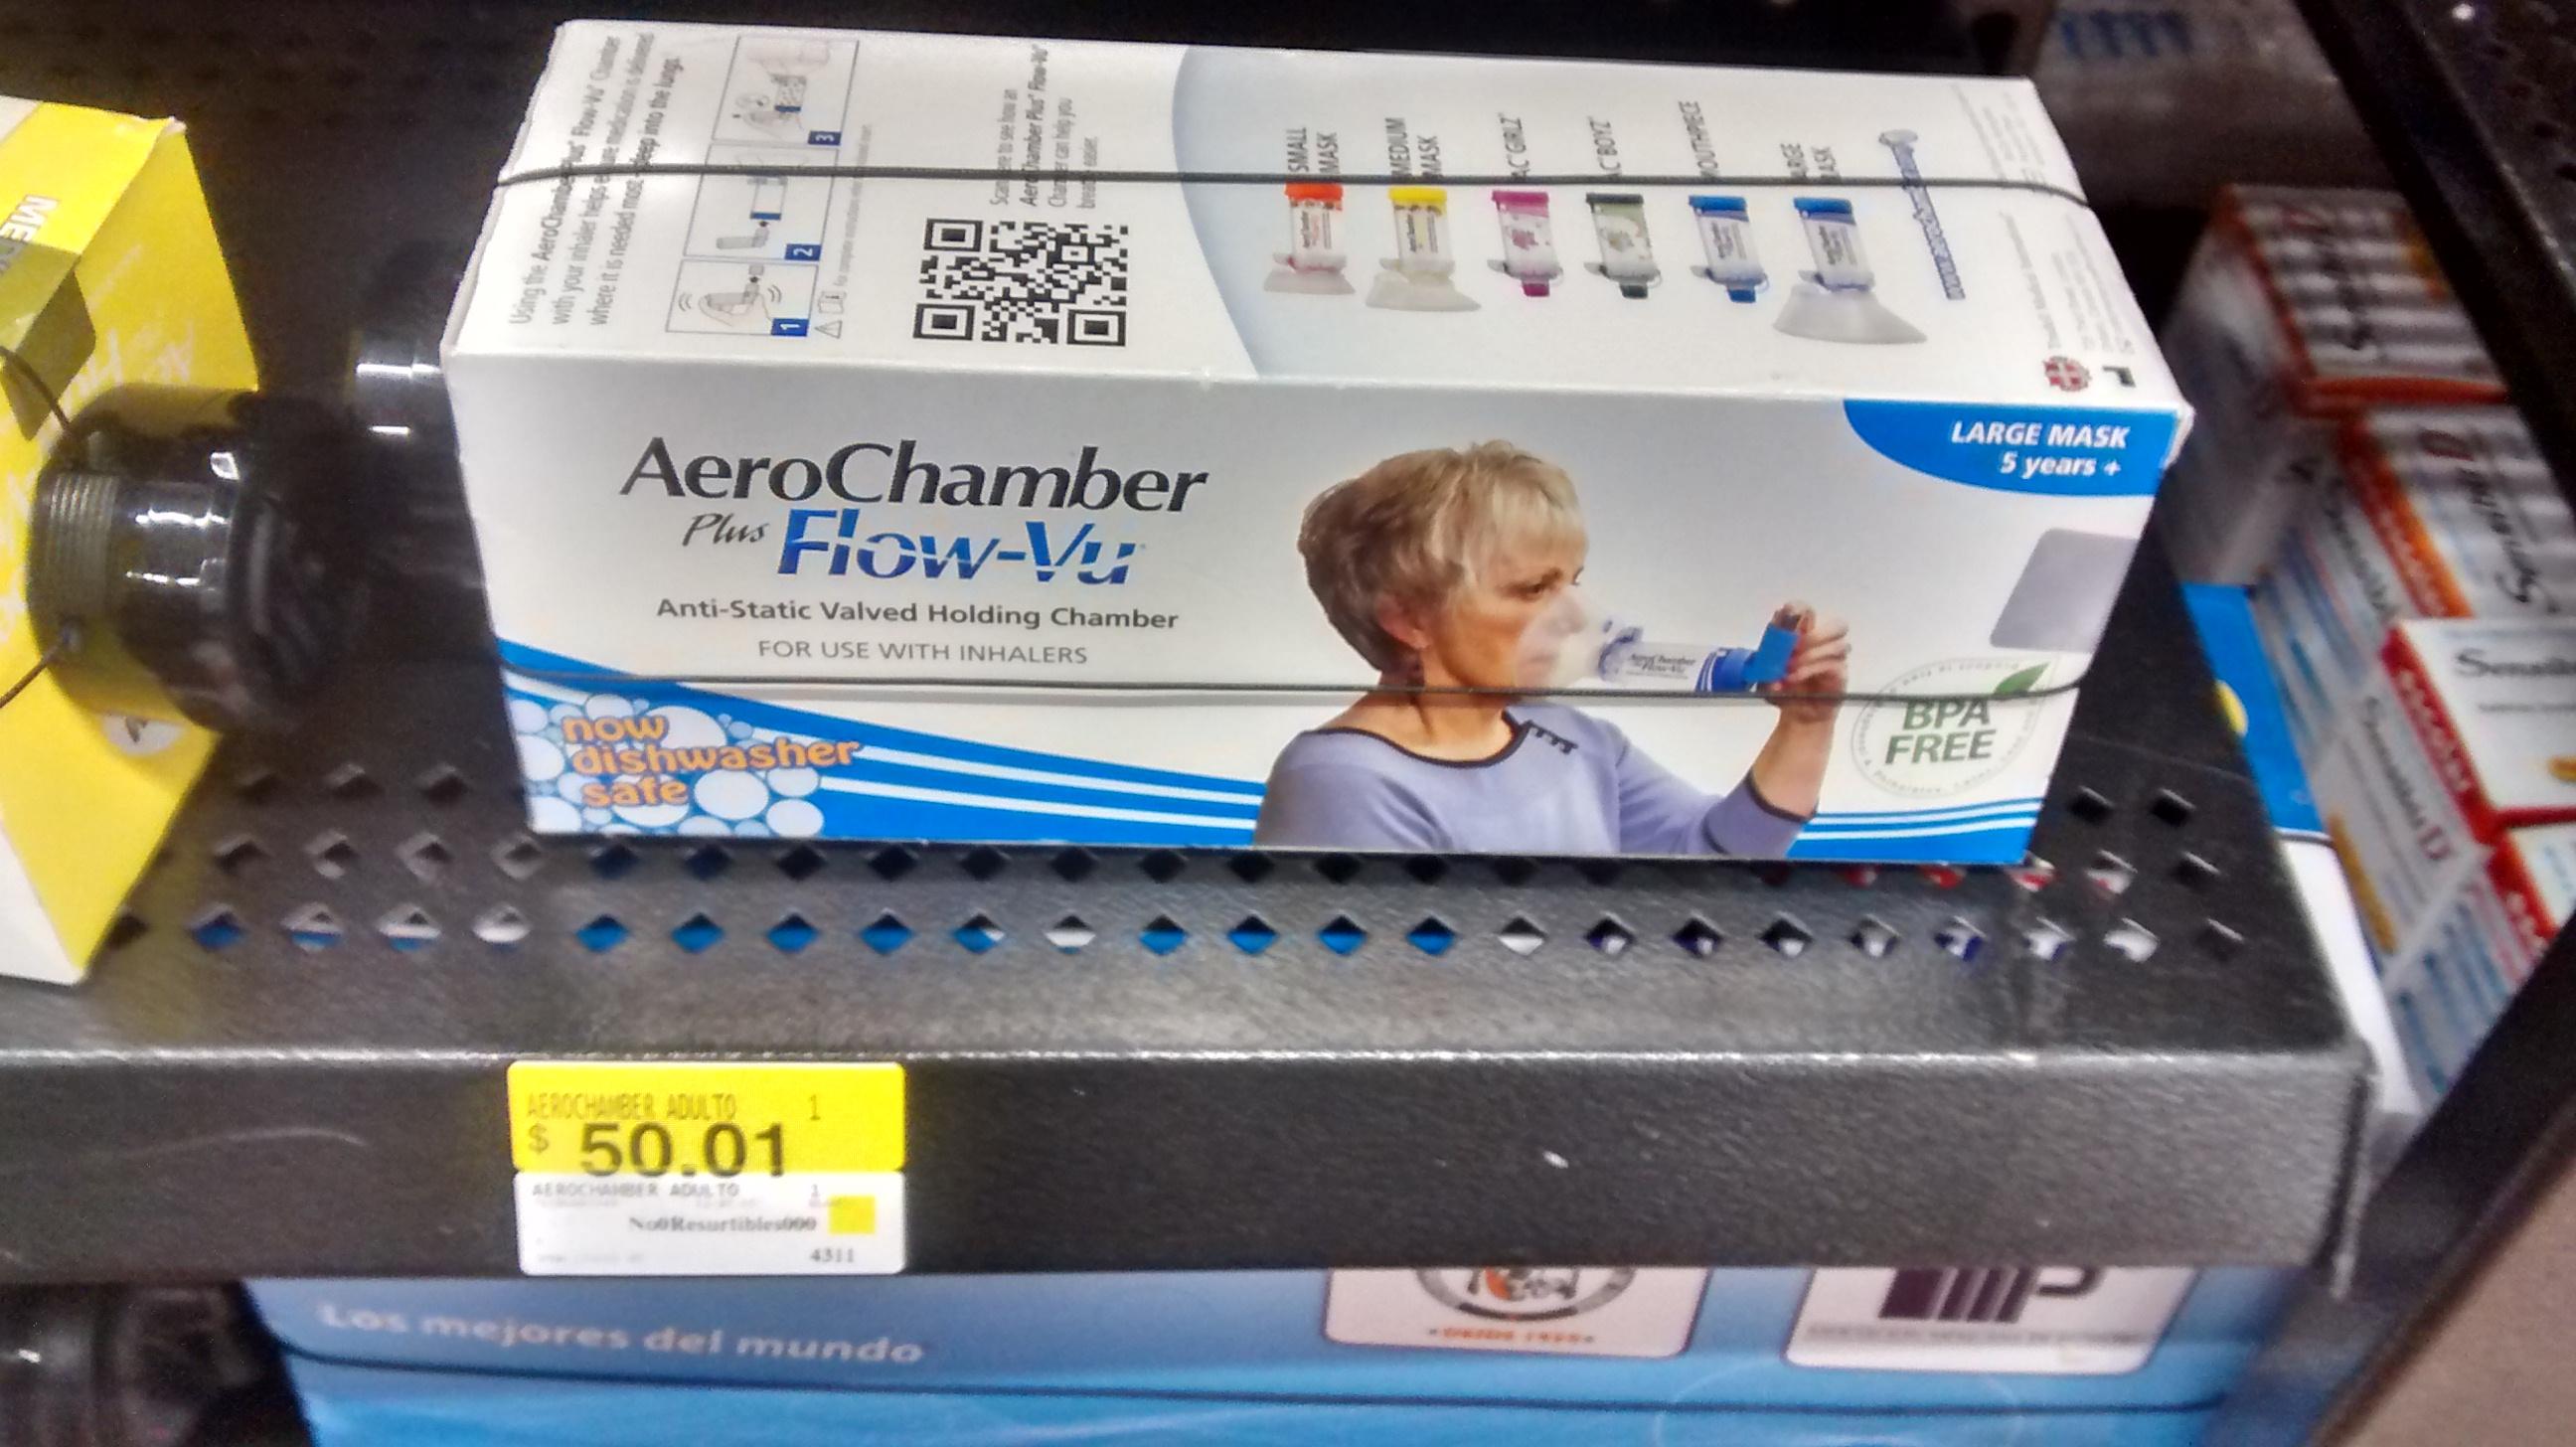 Walmart Patio Santa Fe: Cámara Inhaladora AeroChamber plus Flow-Vu para adulto.